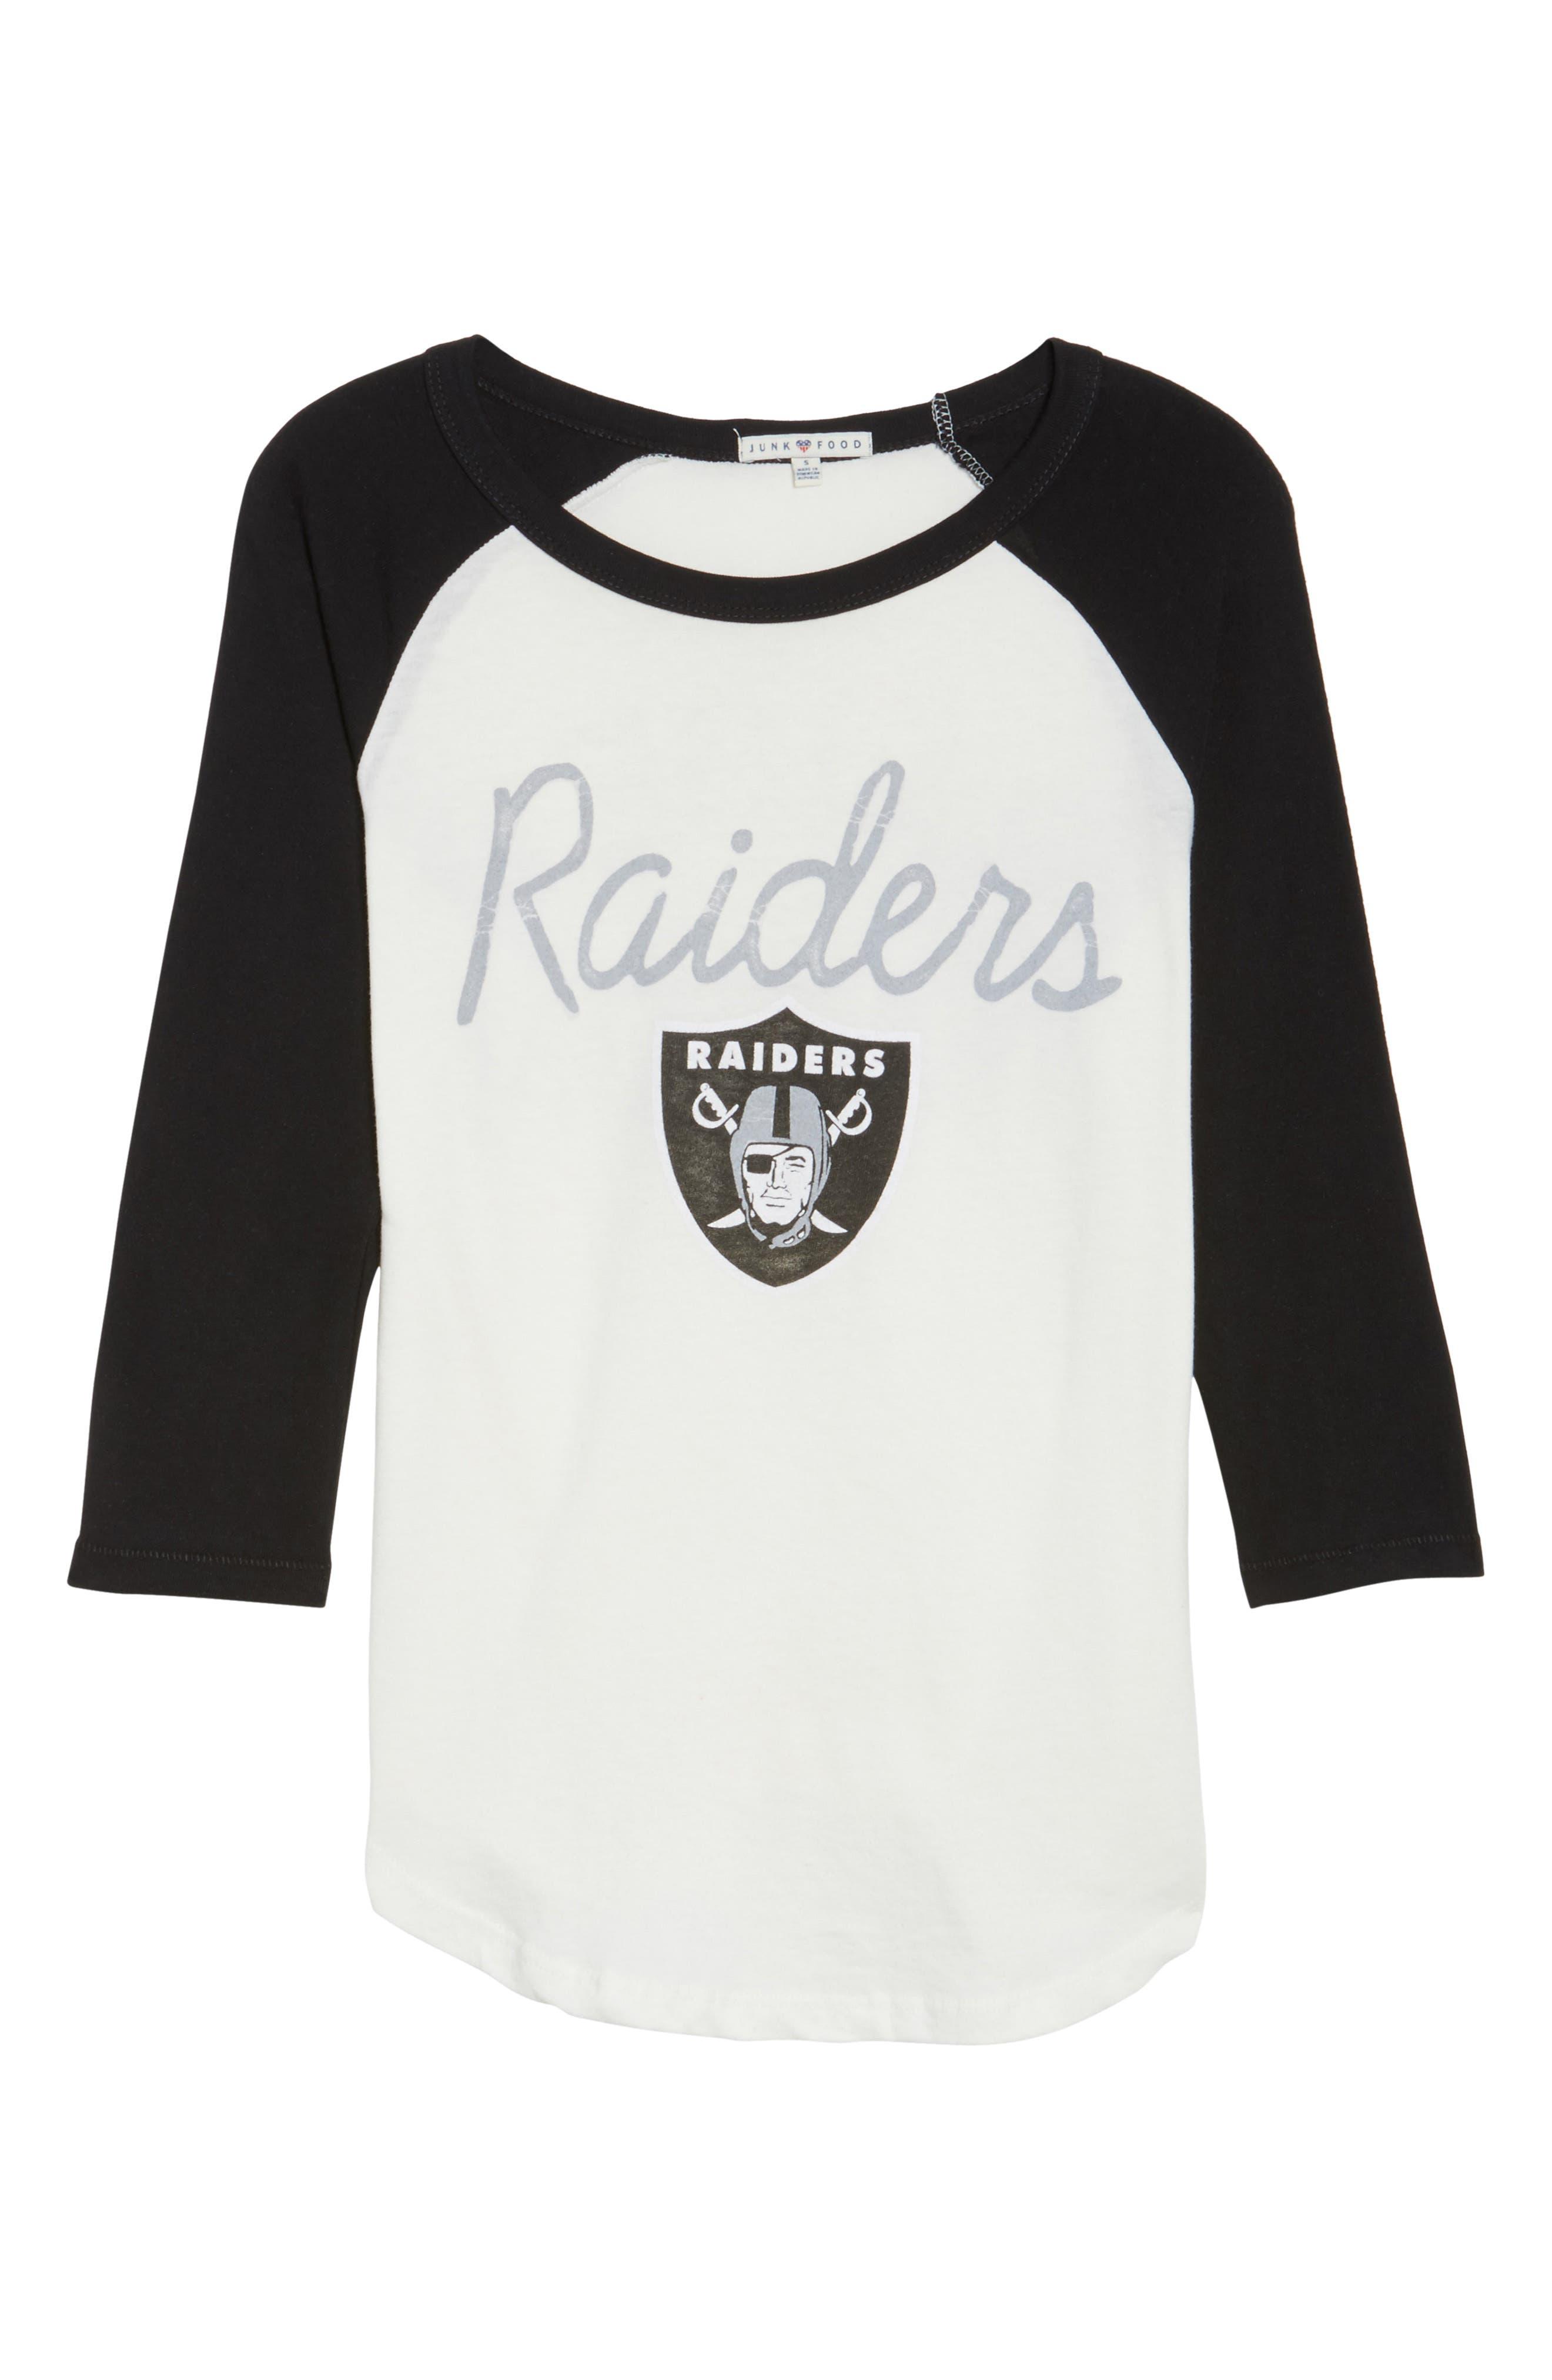 NFL Oakland Raiders Raglan Tee,                             Alternate thumbnail 6, color,                             189